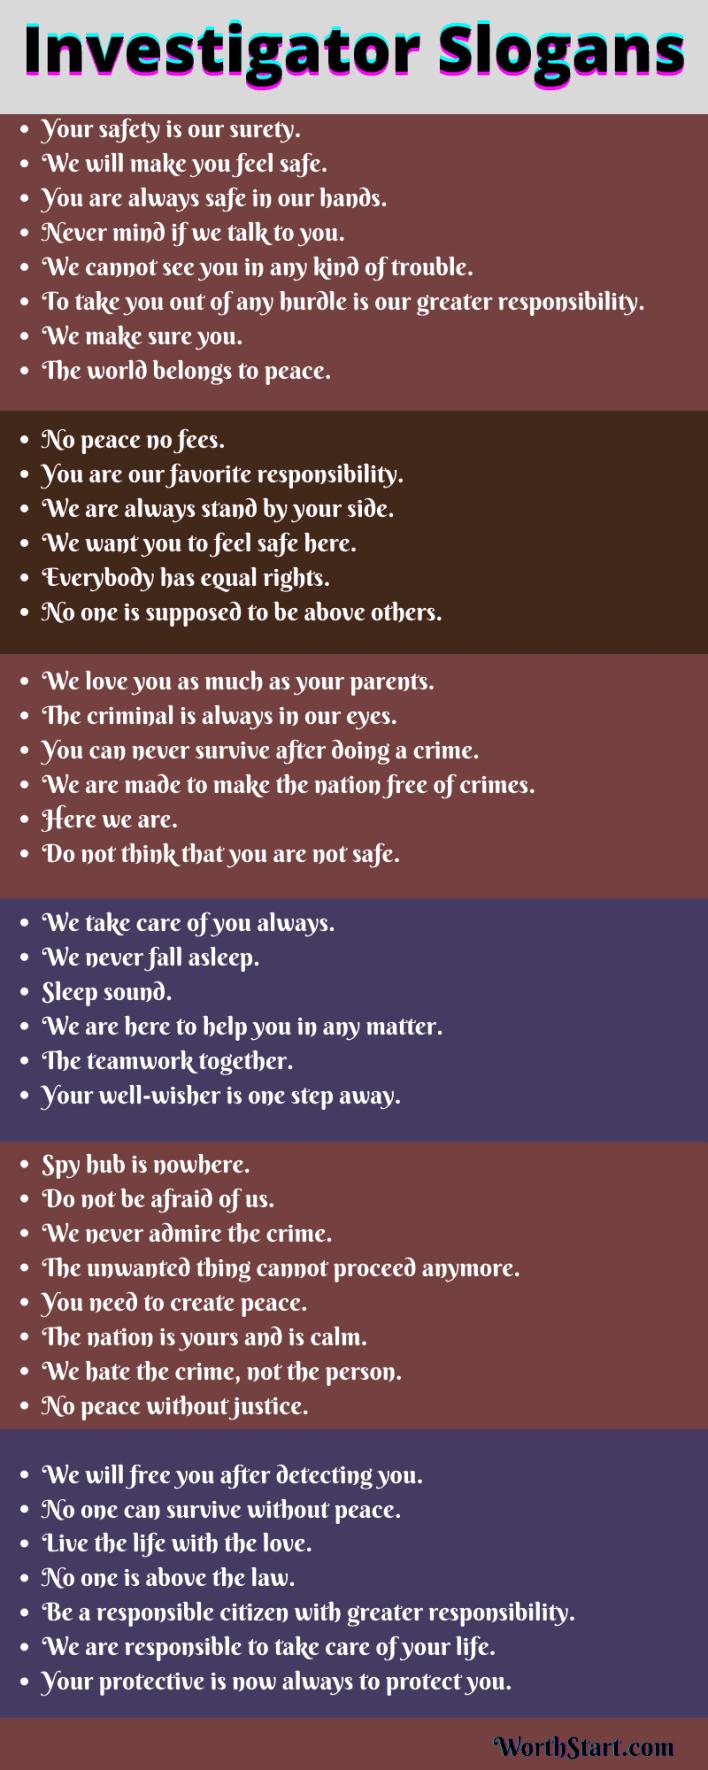 Investigator Slogans